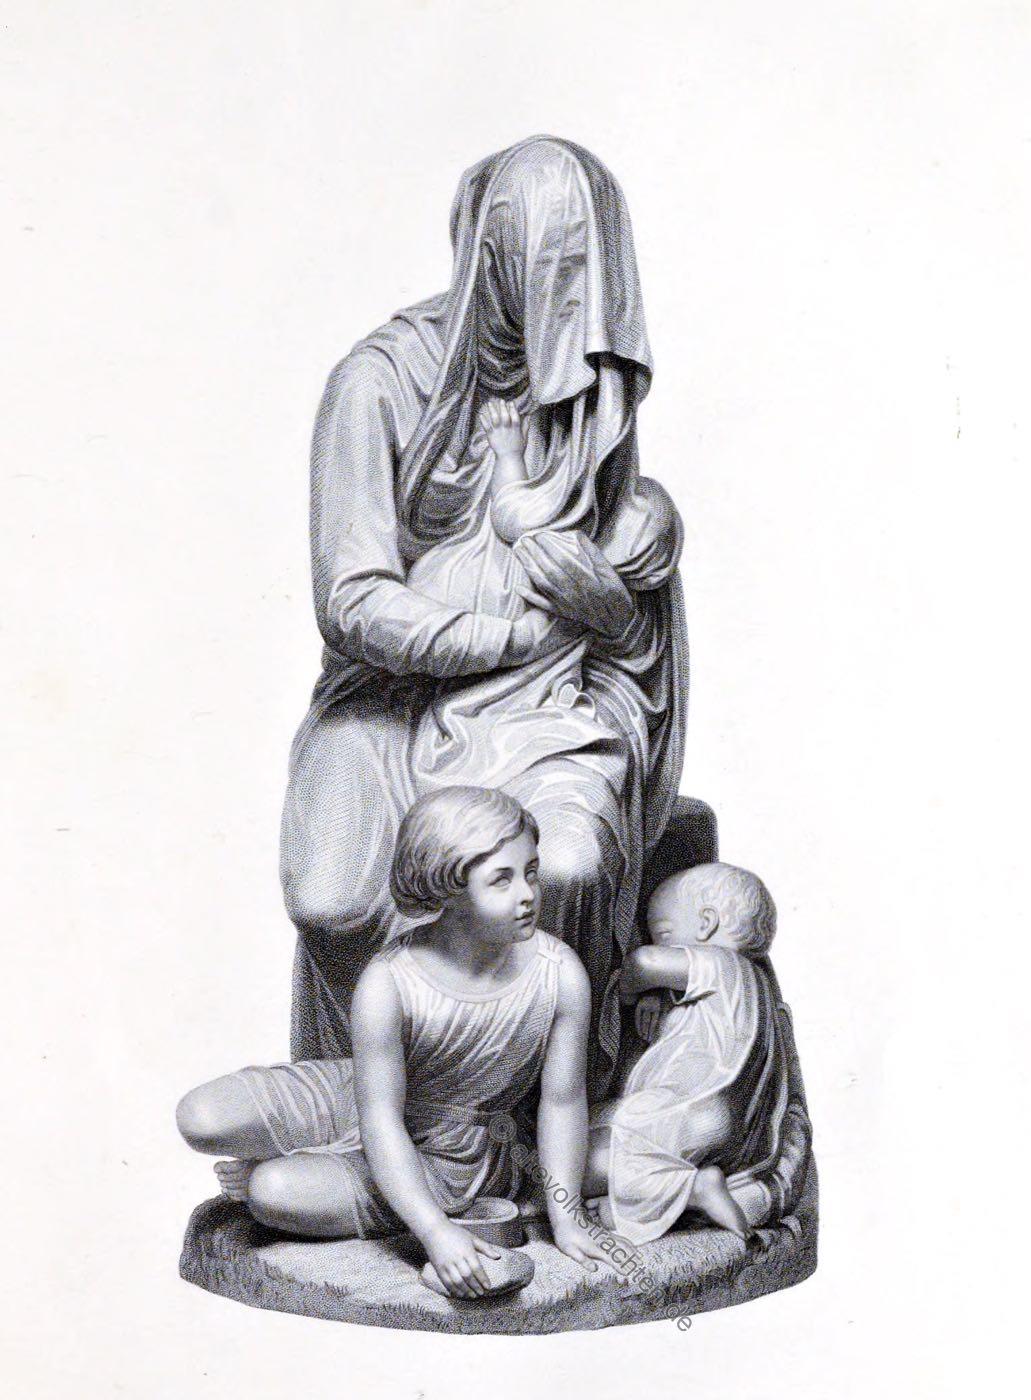 Bashful Beggar, Gandolph, Milan, sculpture